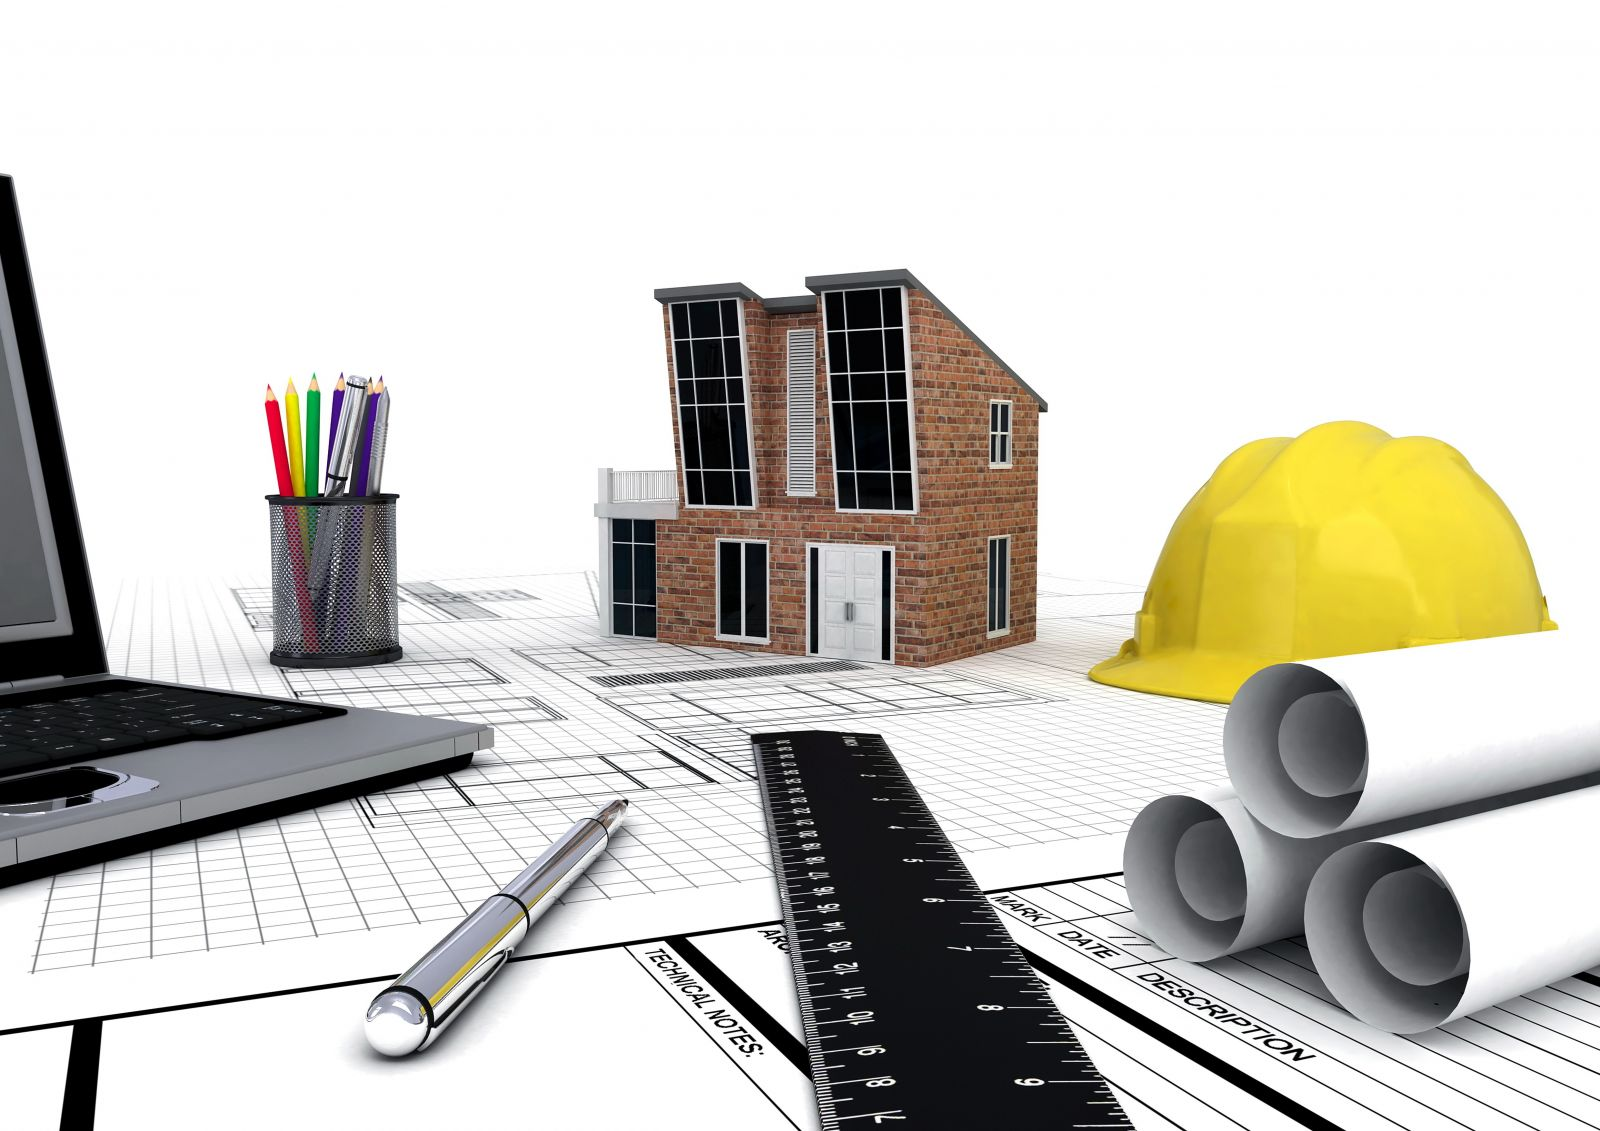 les diagnostics immobiliers obligatoires immo blog immobilier. Black Bedroom Furniture Sets. Home Design Ideas